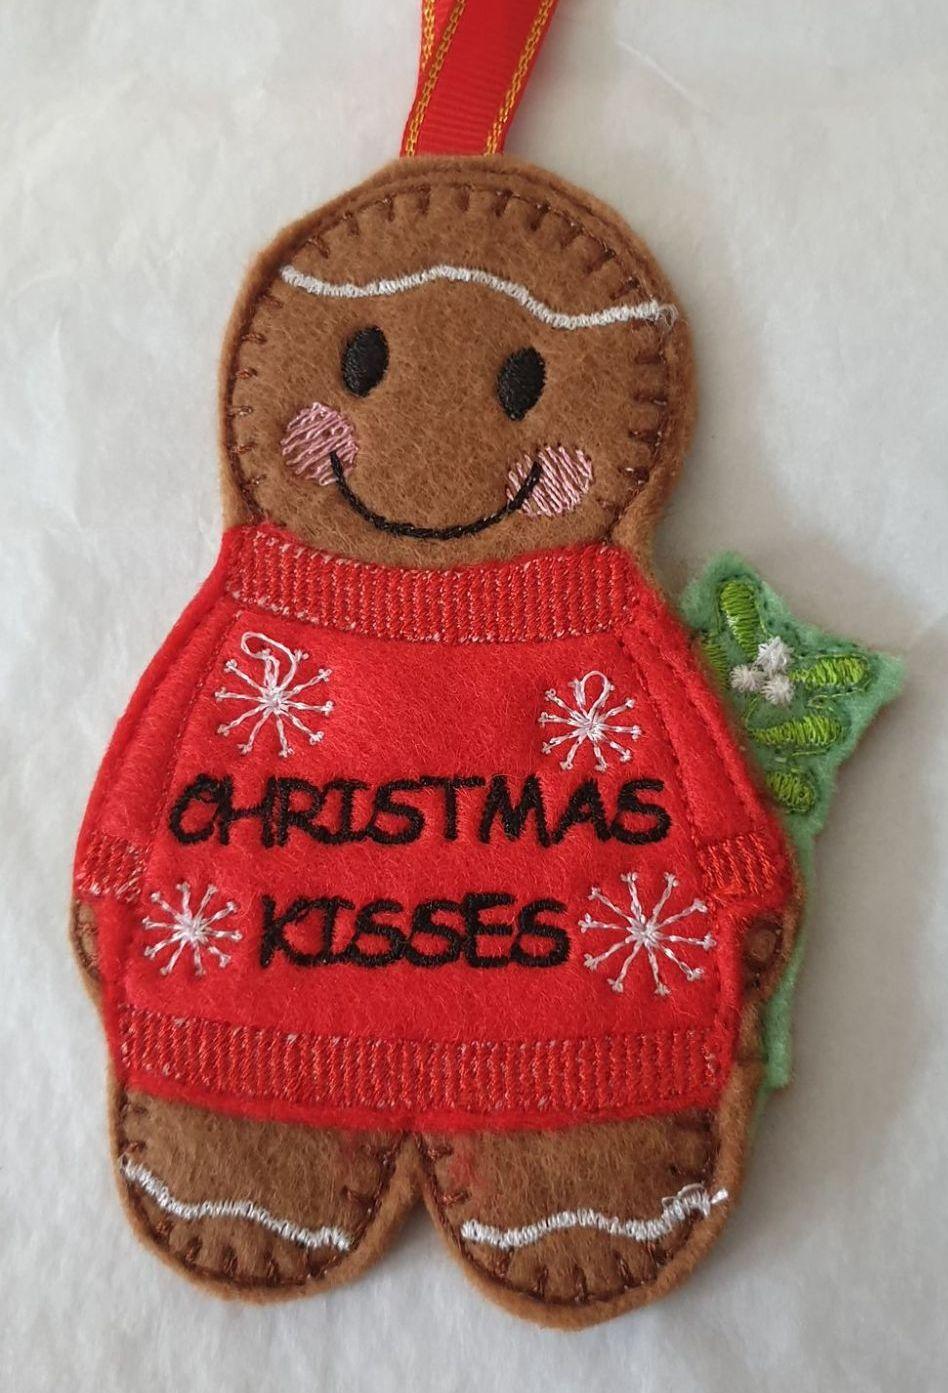 Christmas Kisses Gingerbread